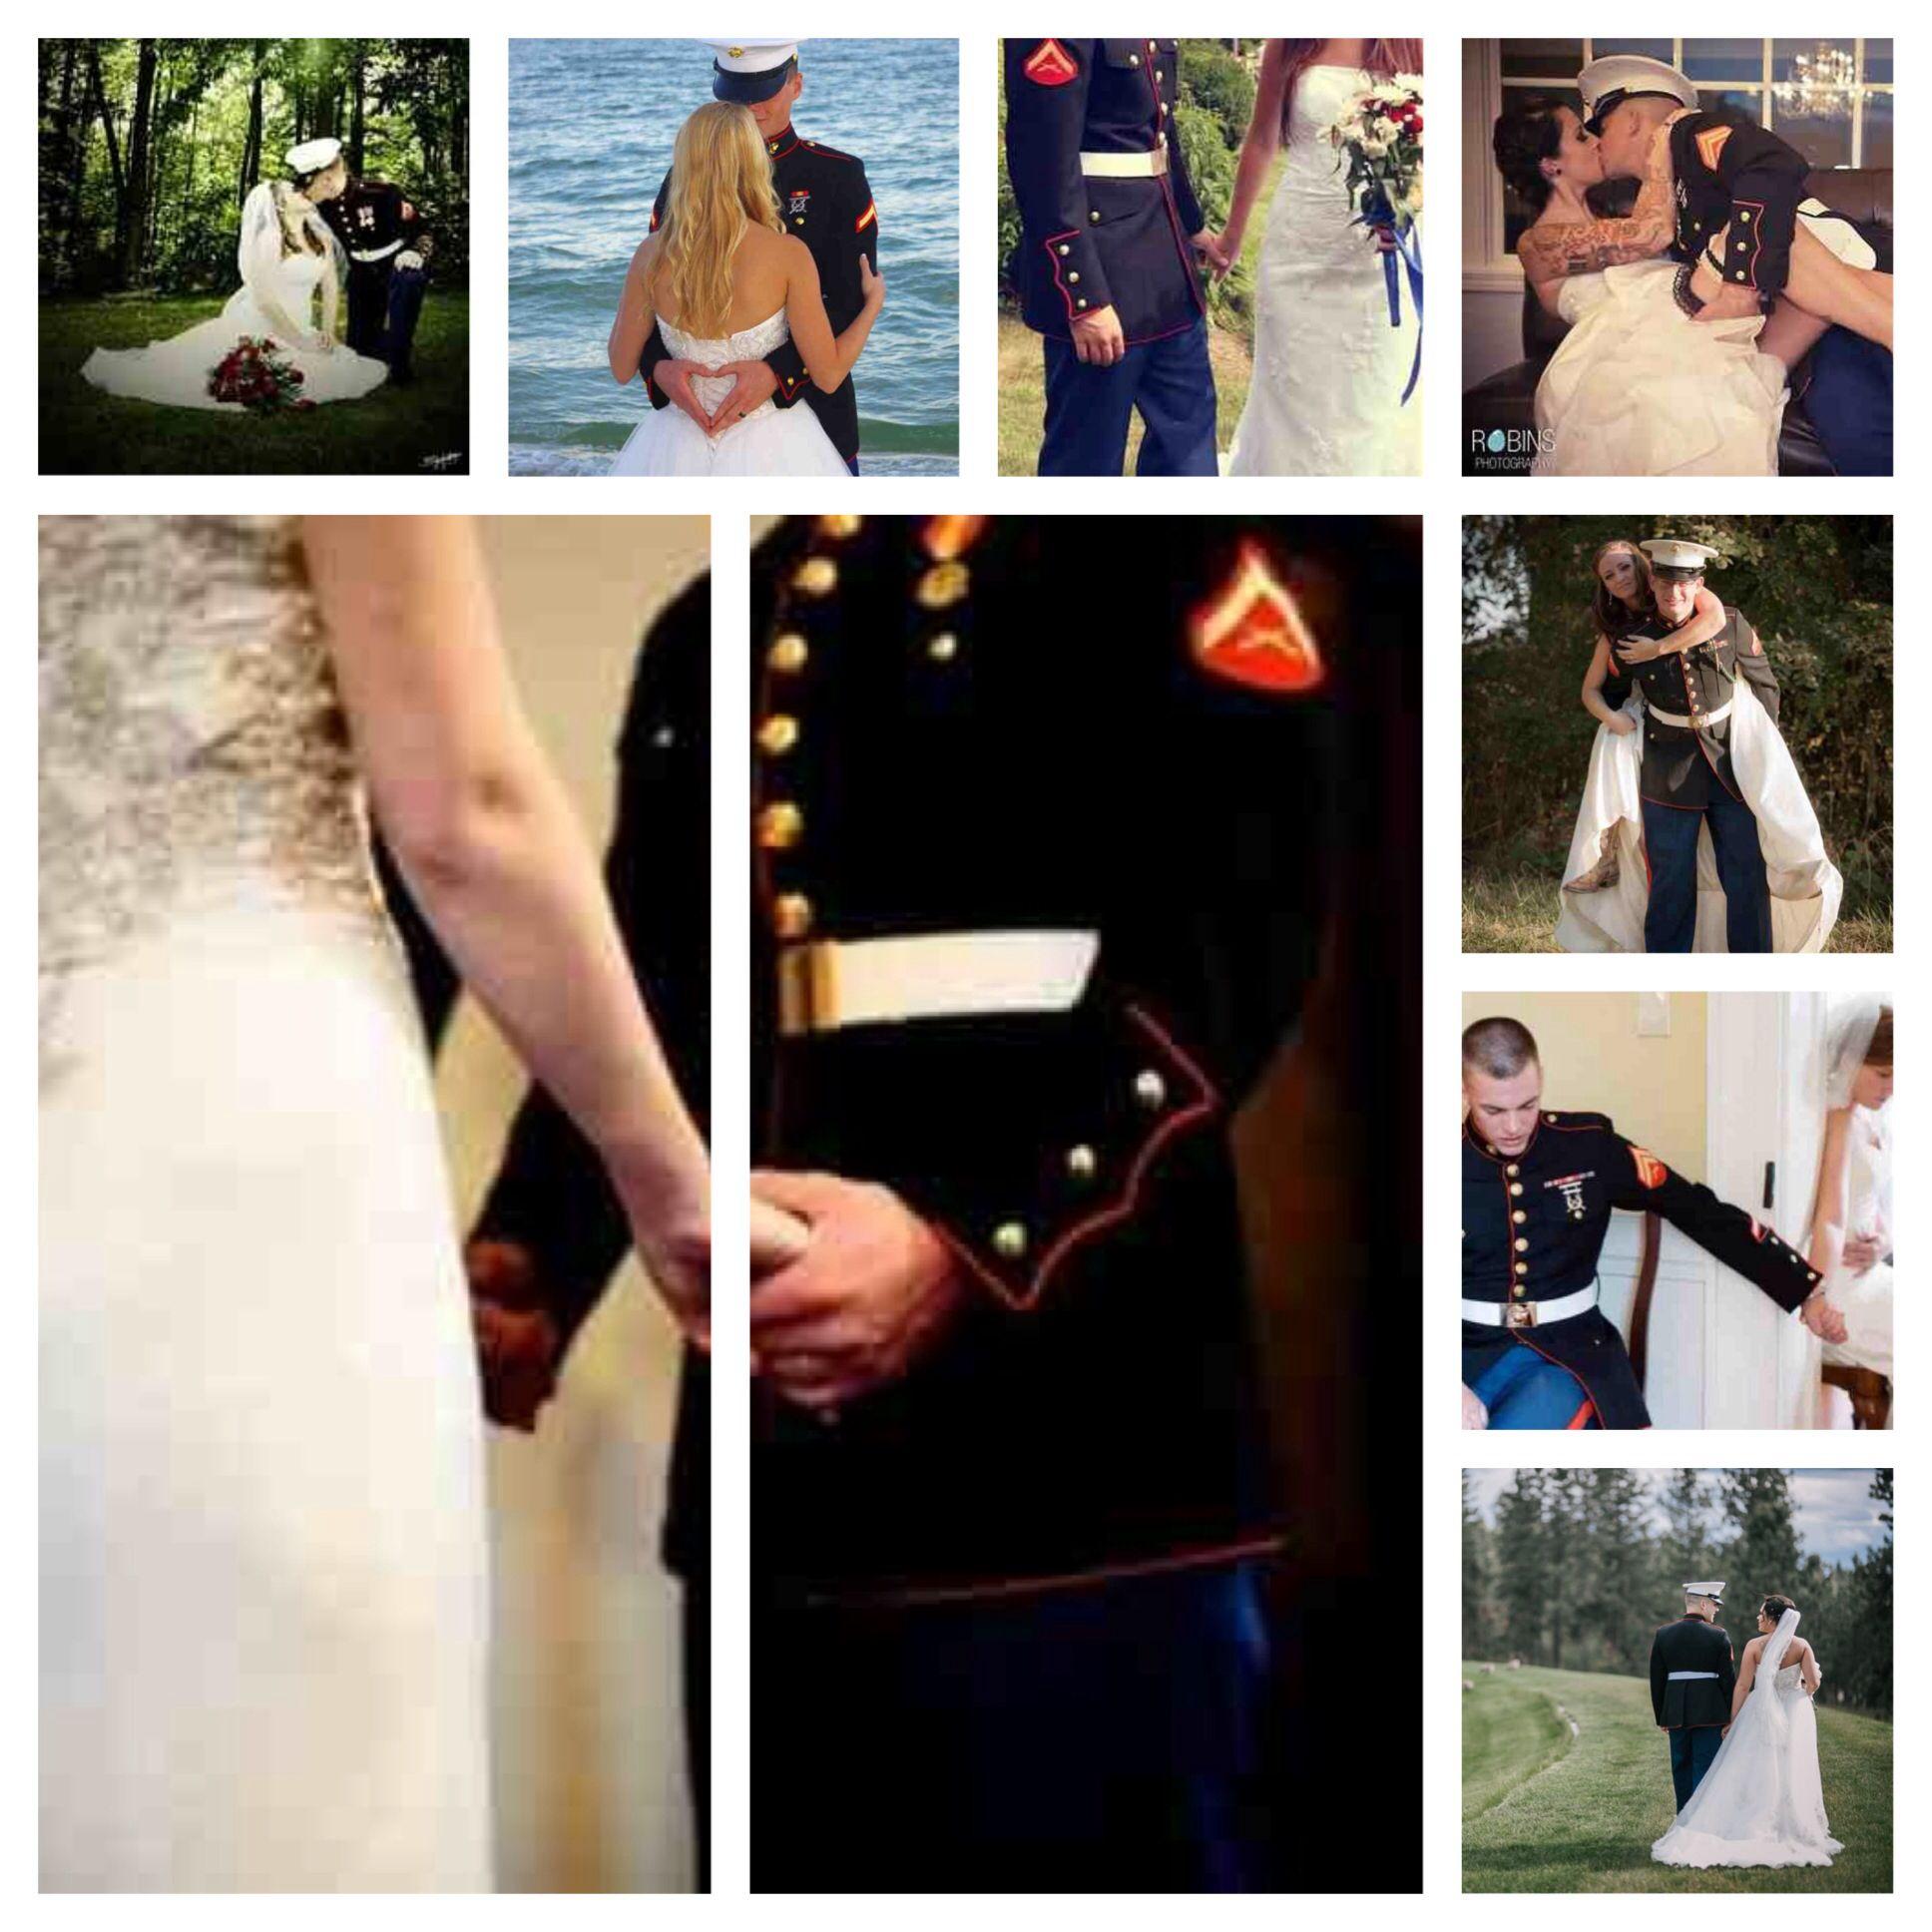 Marine couples | So cute | Pinterest